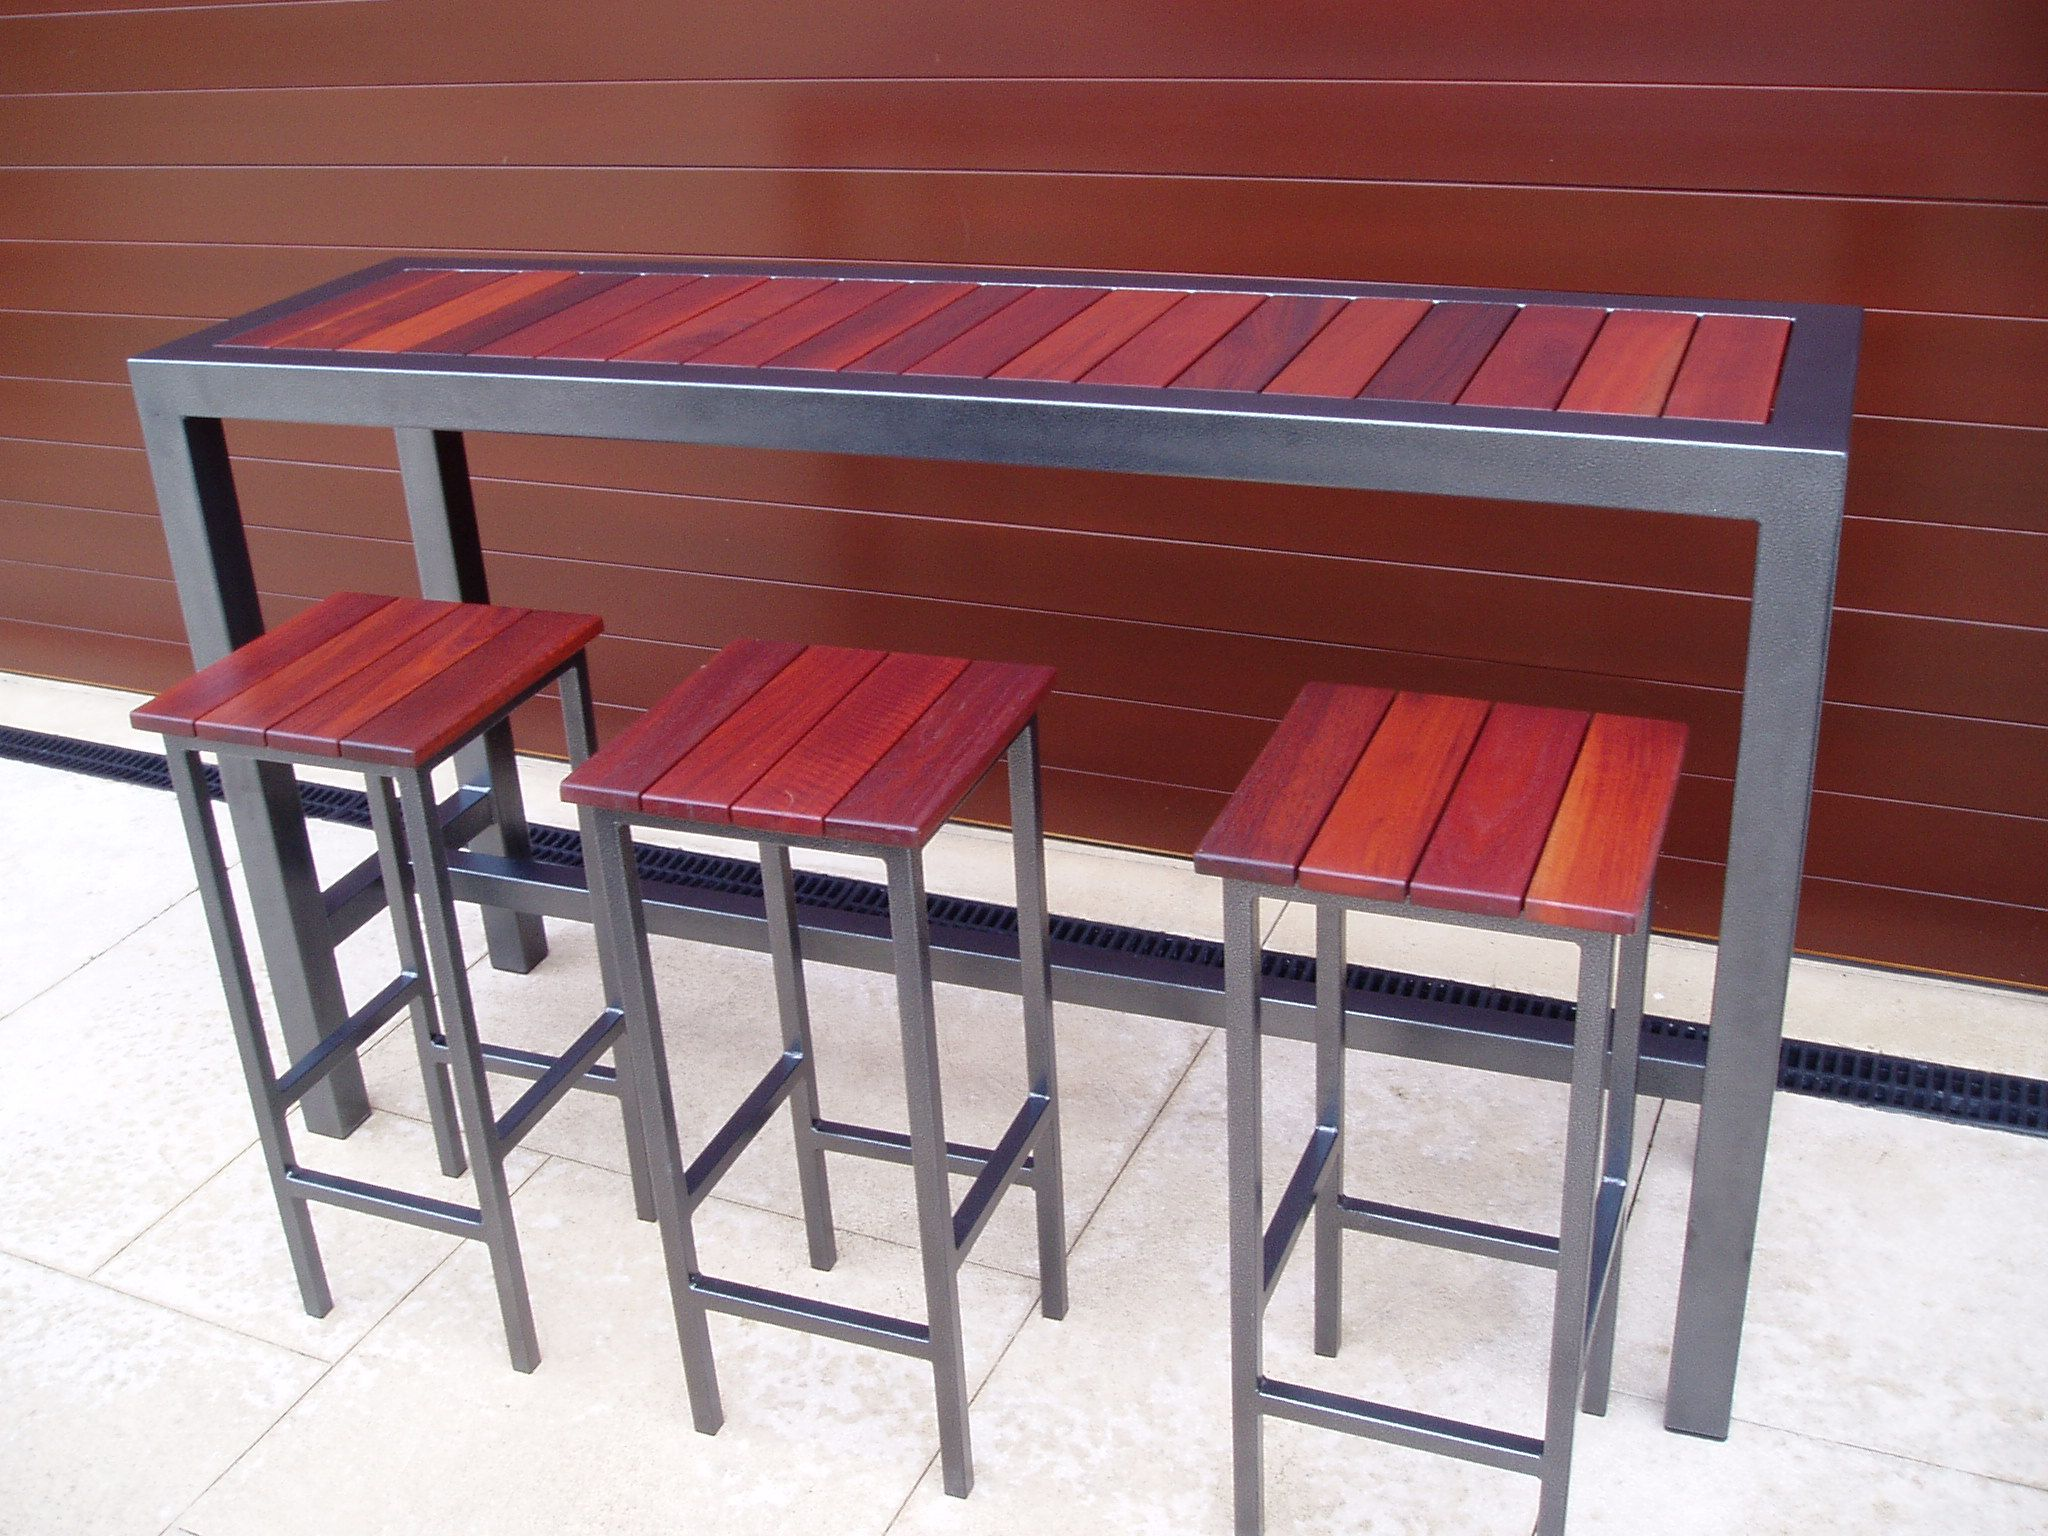 Rote Bar Hocker Theke Höhe Outdoor Cabinet Hardware Raum